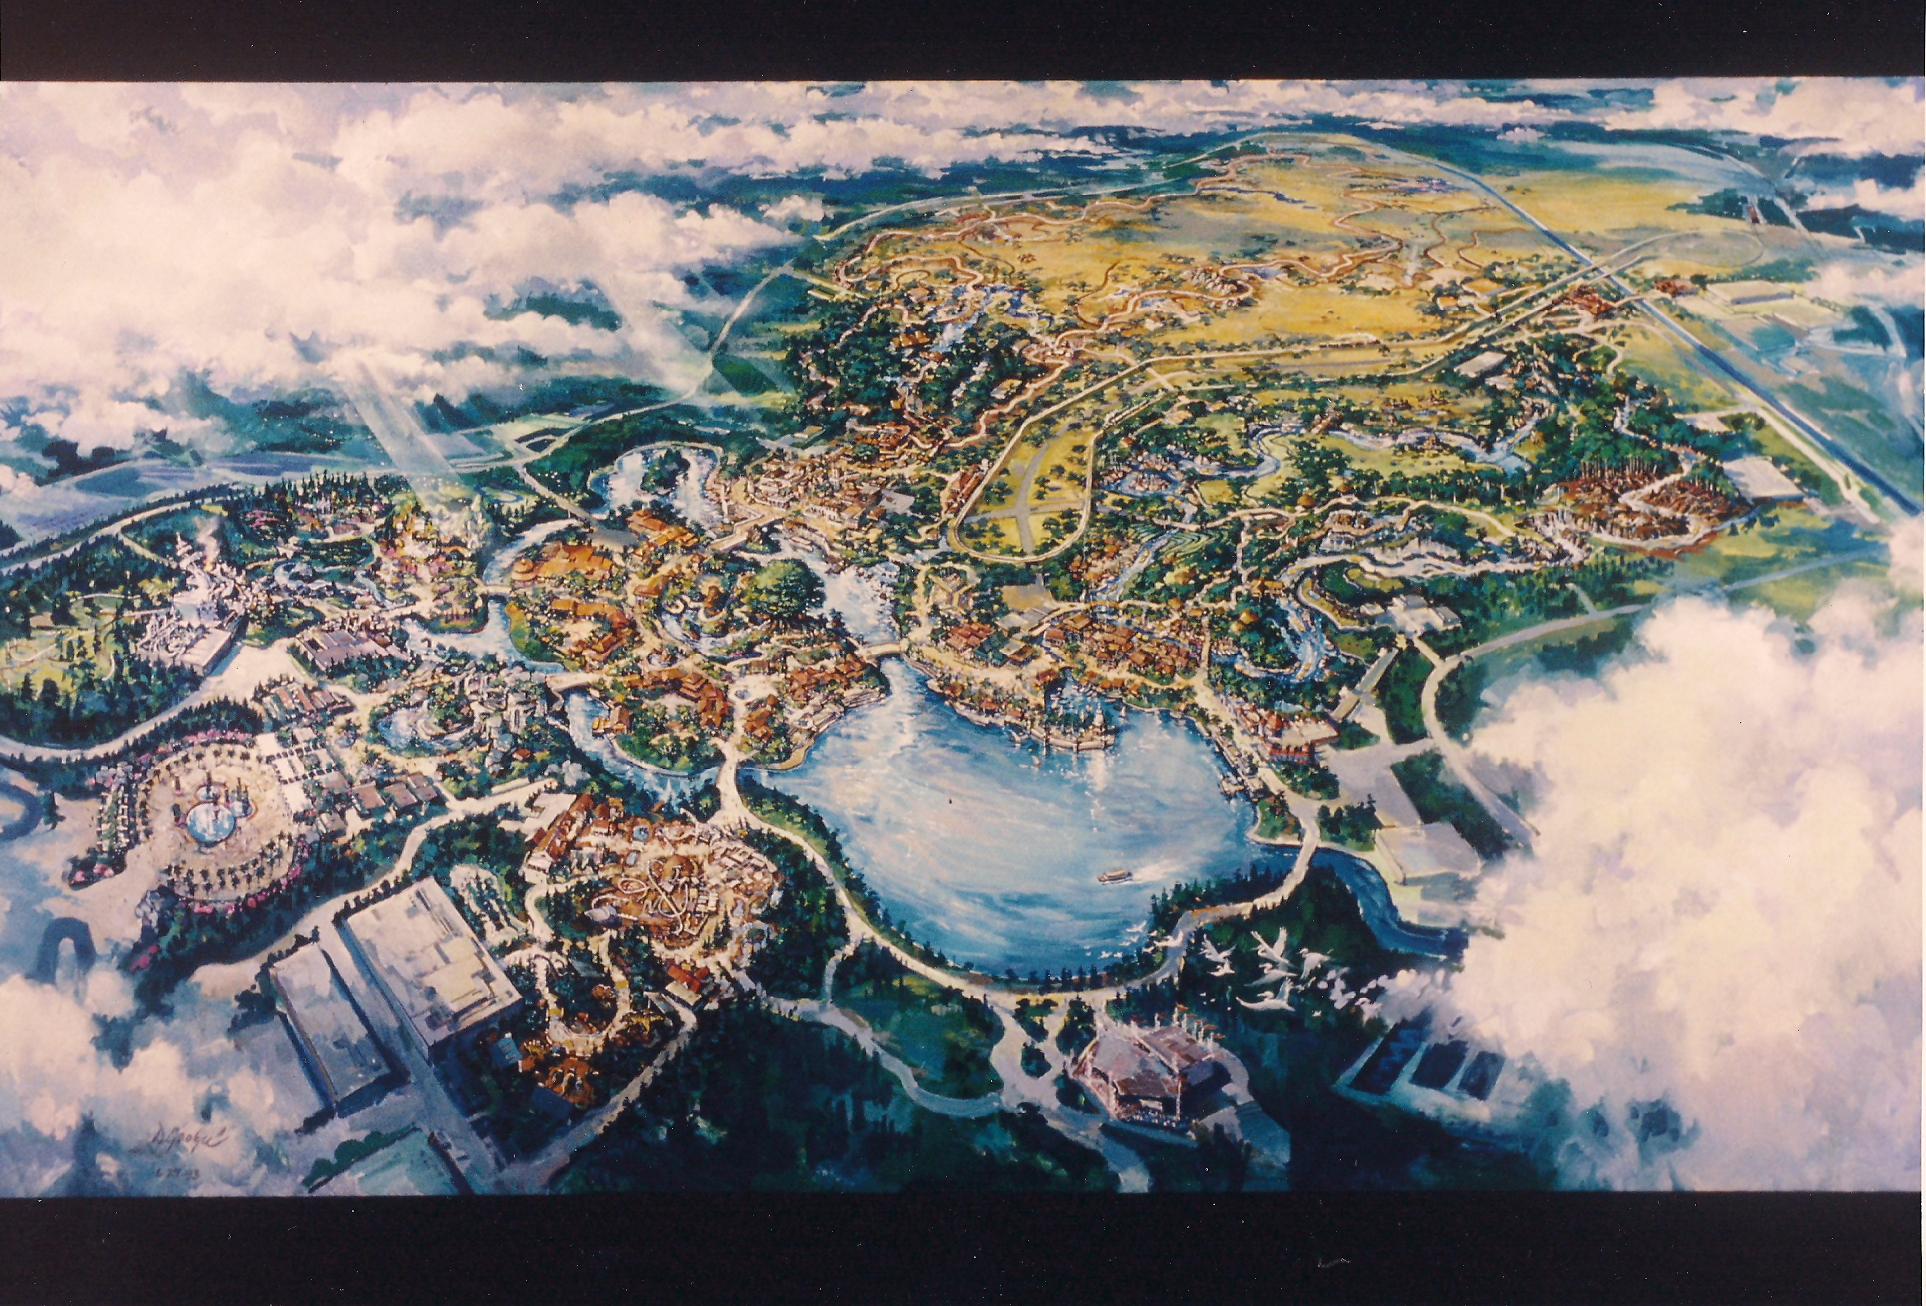 Wild Animal Kingdom: 1995 Animal Kingdom Press Packet; original layout of the park